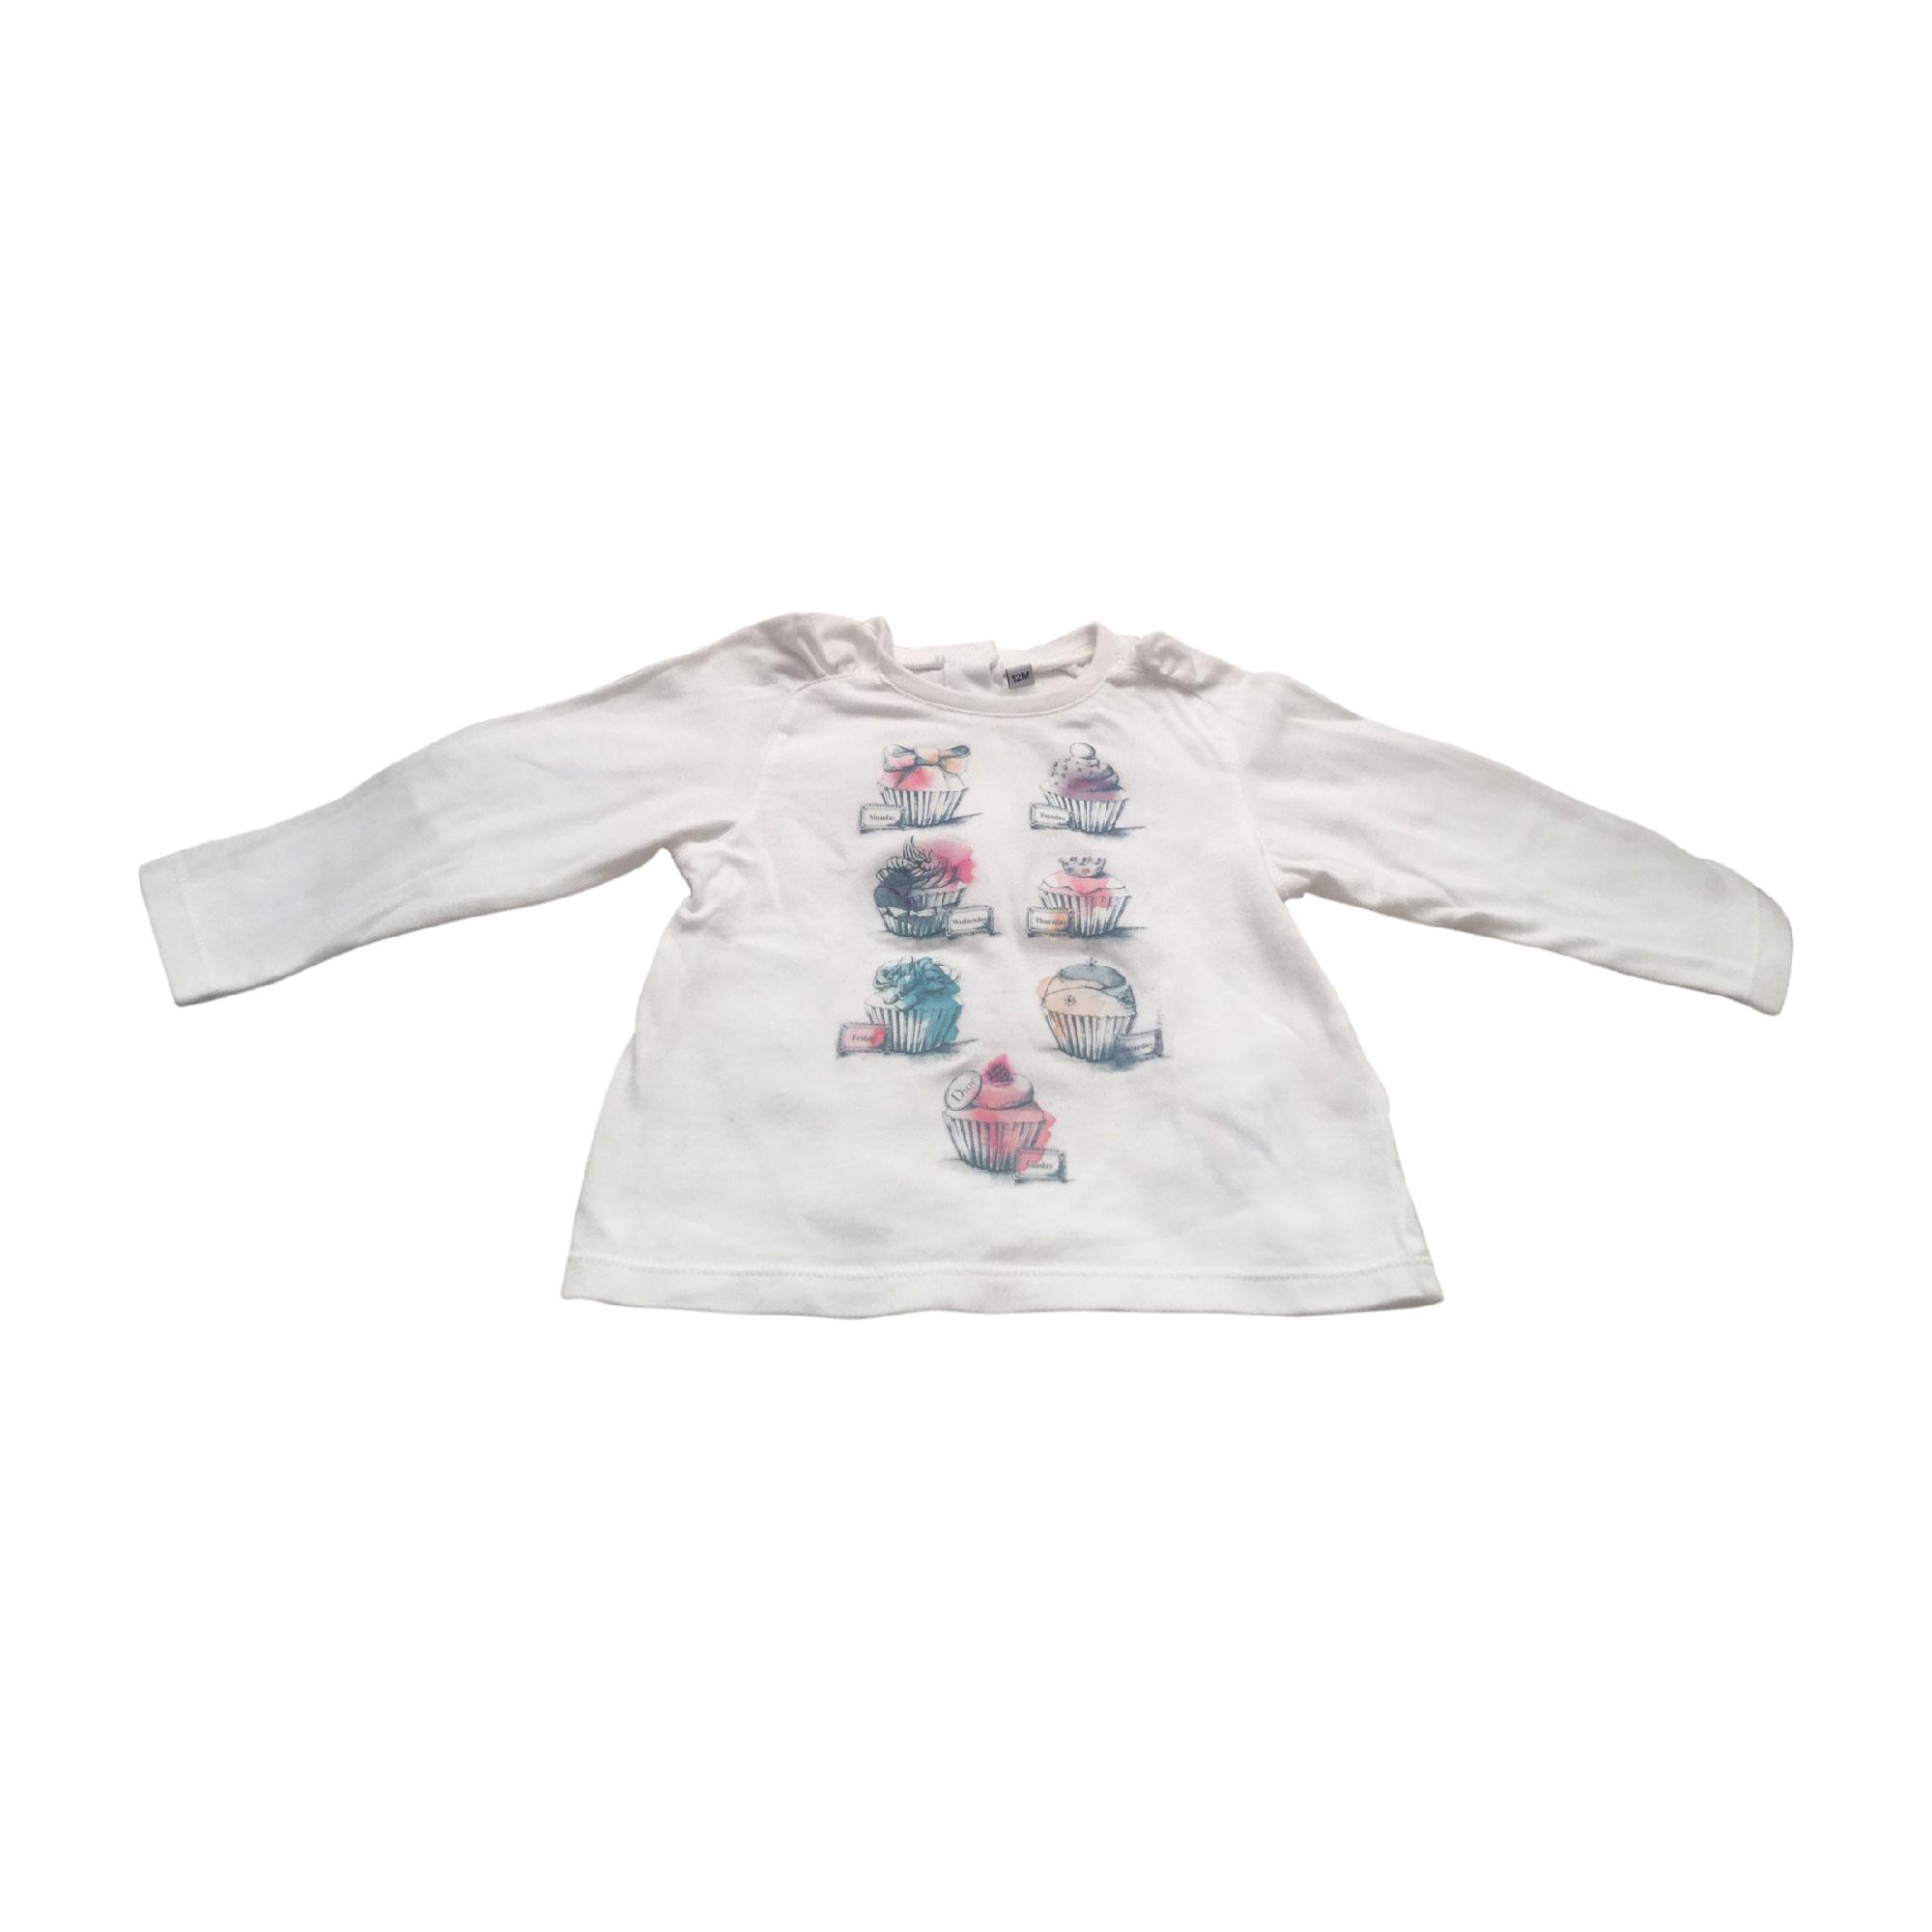 Top, tee shirt BABY DIOR Rose, fuschia, vieux rose